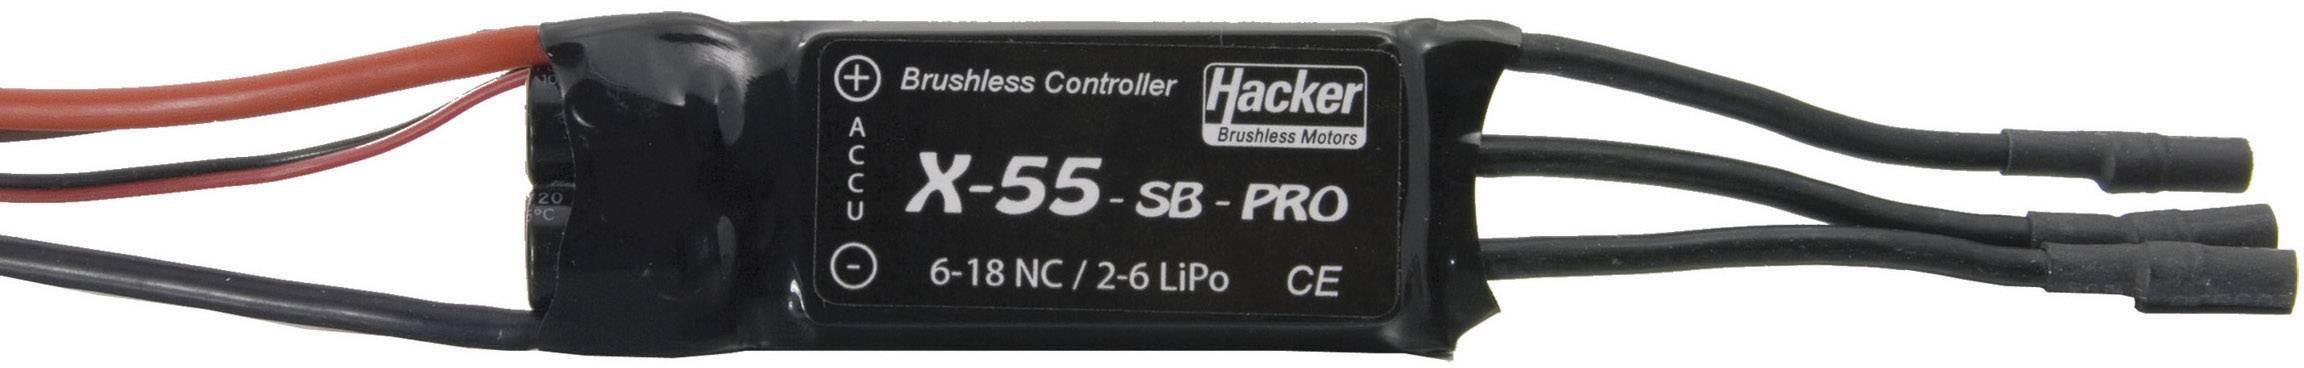 Regulátor otáček Brushless Hacker X-Pro, 8 - 18 NiCd / 2 - 6 LiPo, 55 A, JR